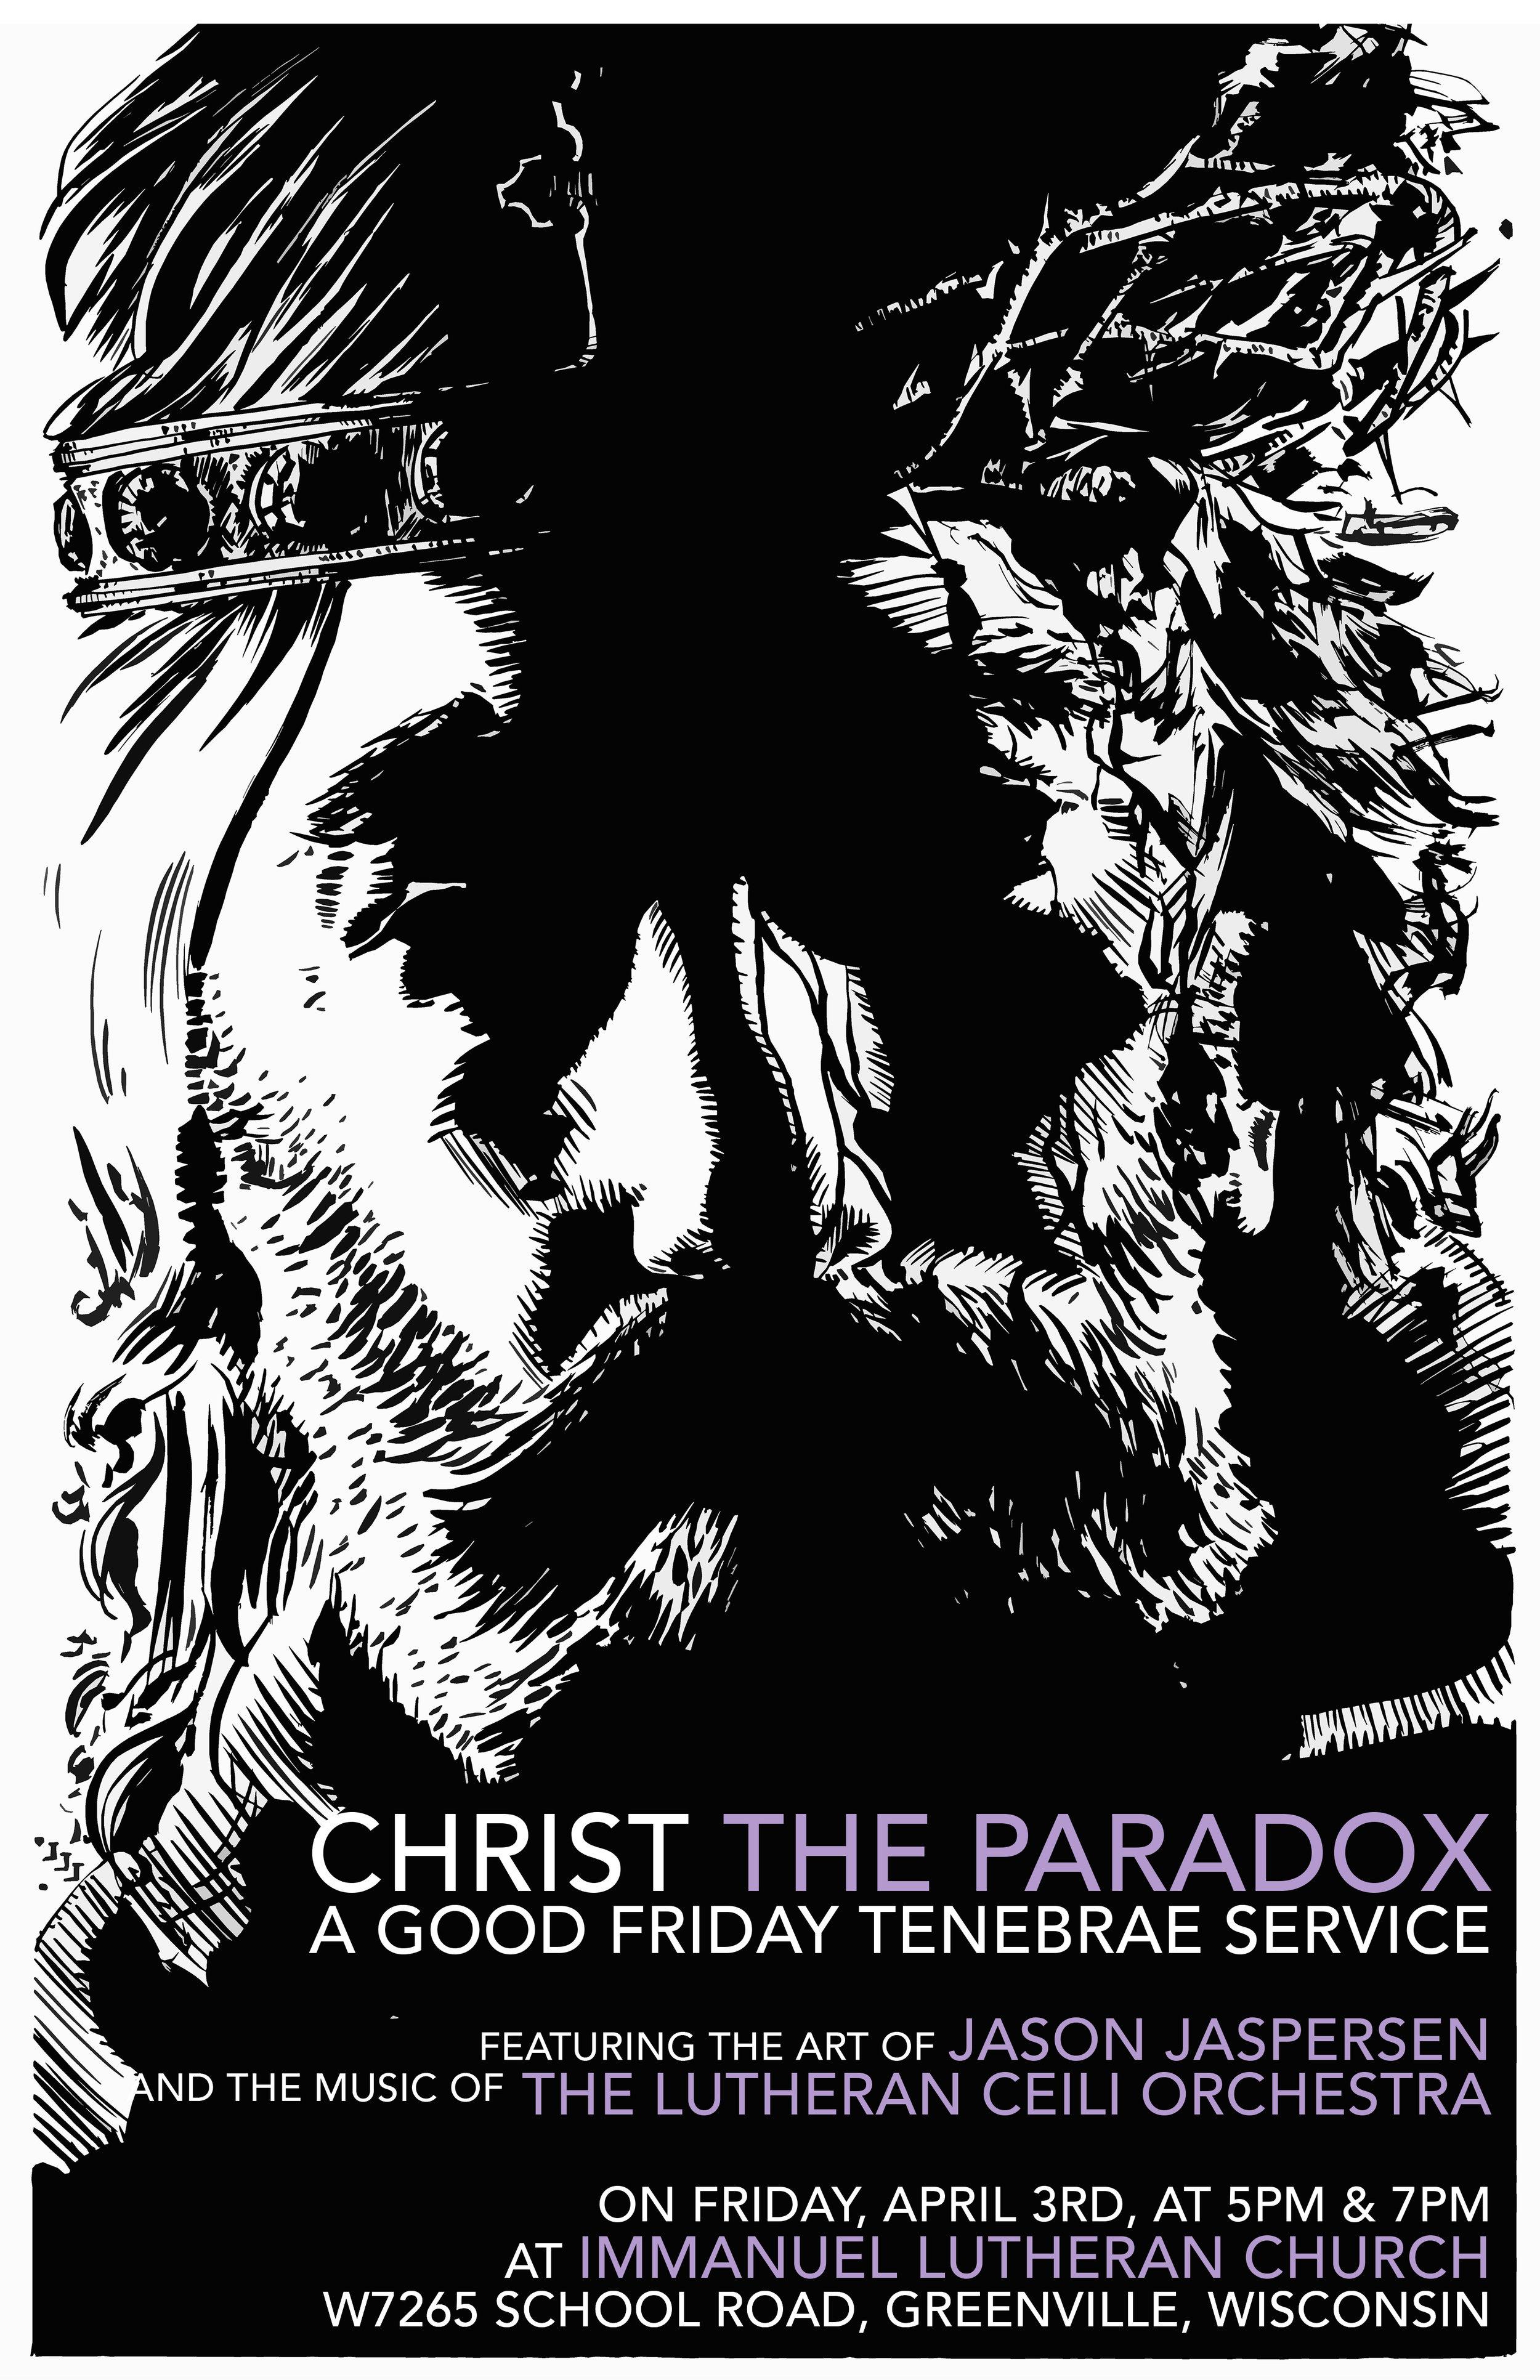 Tenebrae 2015 - Christus Paradox - Promo Poster - 11x17.jpg